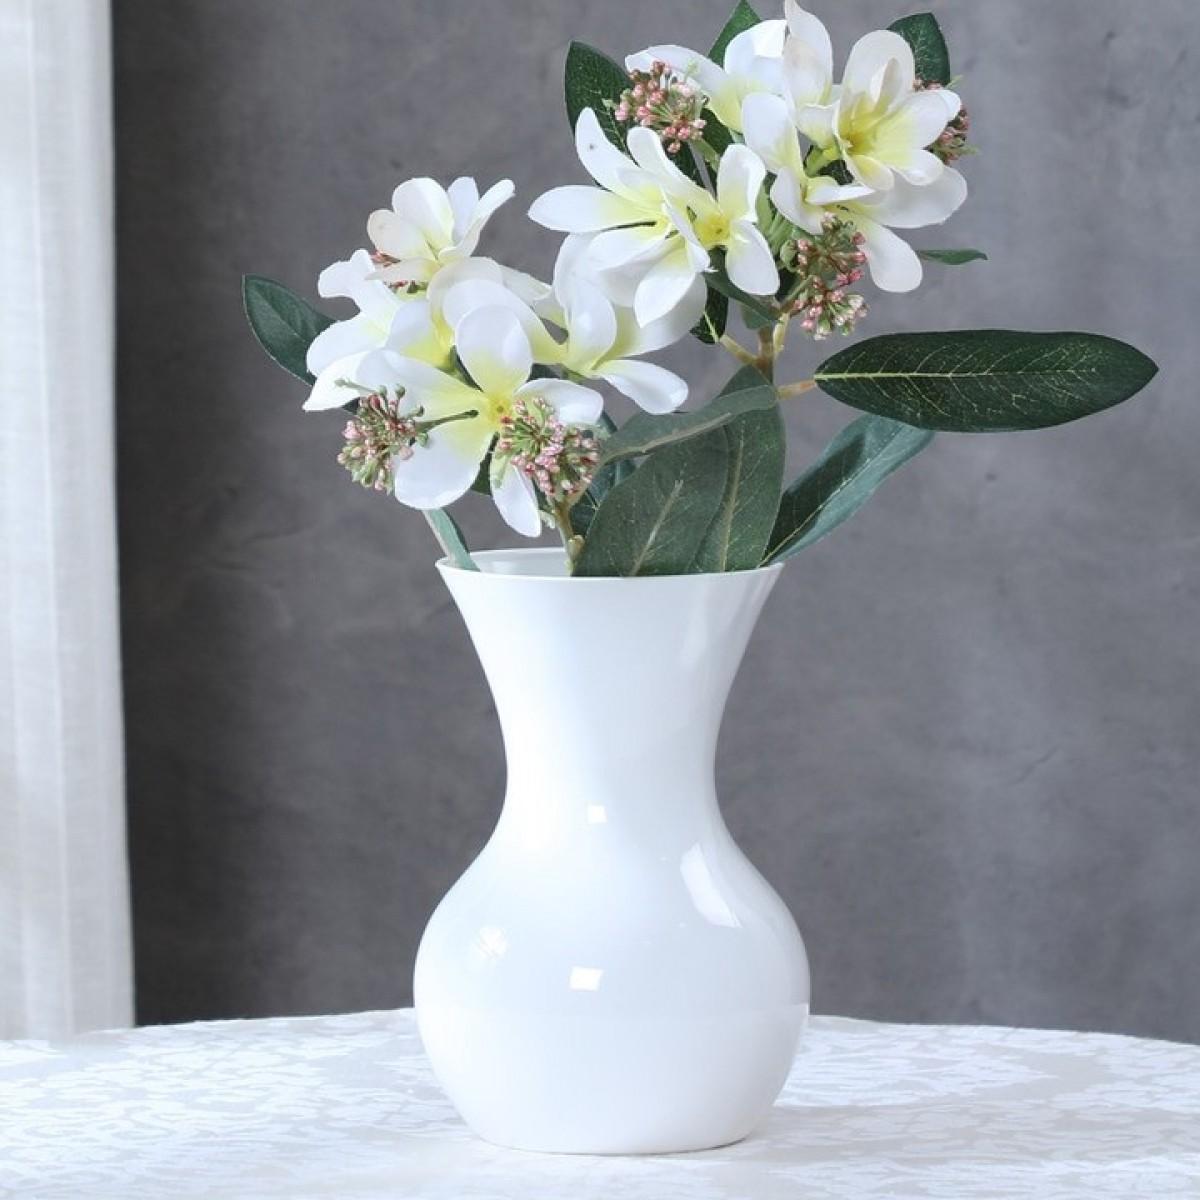 Sweeatheart White 11x18cm Acrylic Vase - 1 No